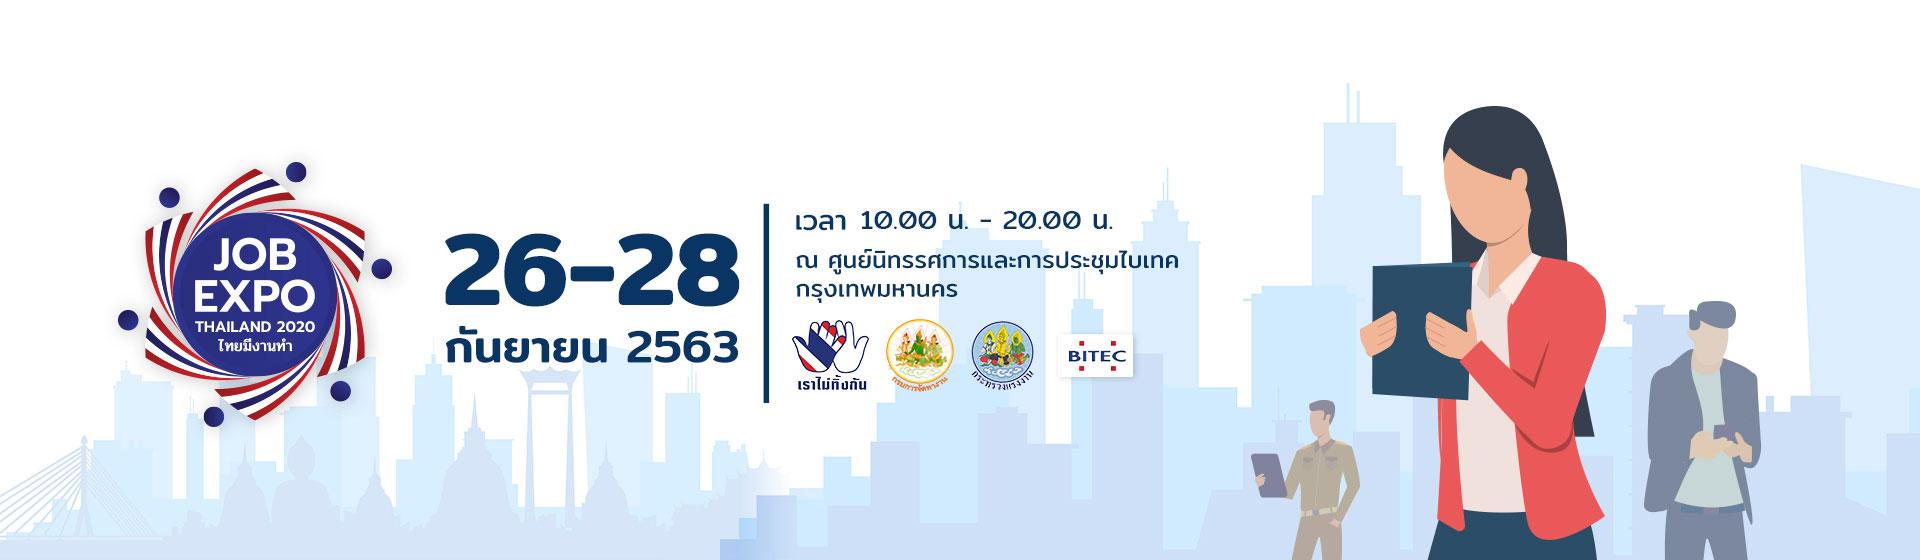 Job Expo thailand 2020 (ไทยมีงานทำ.com)